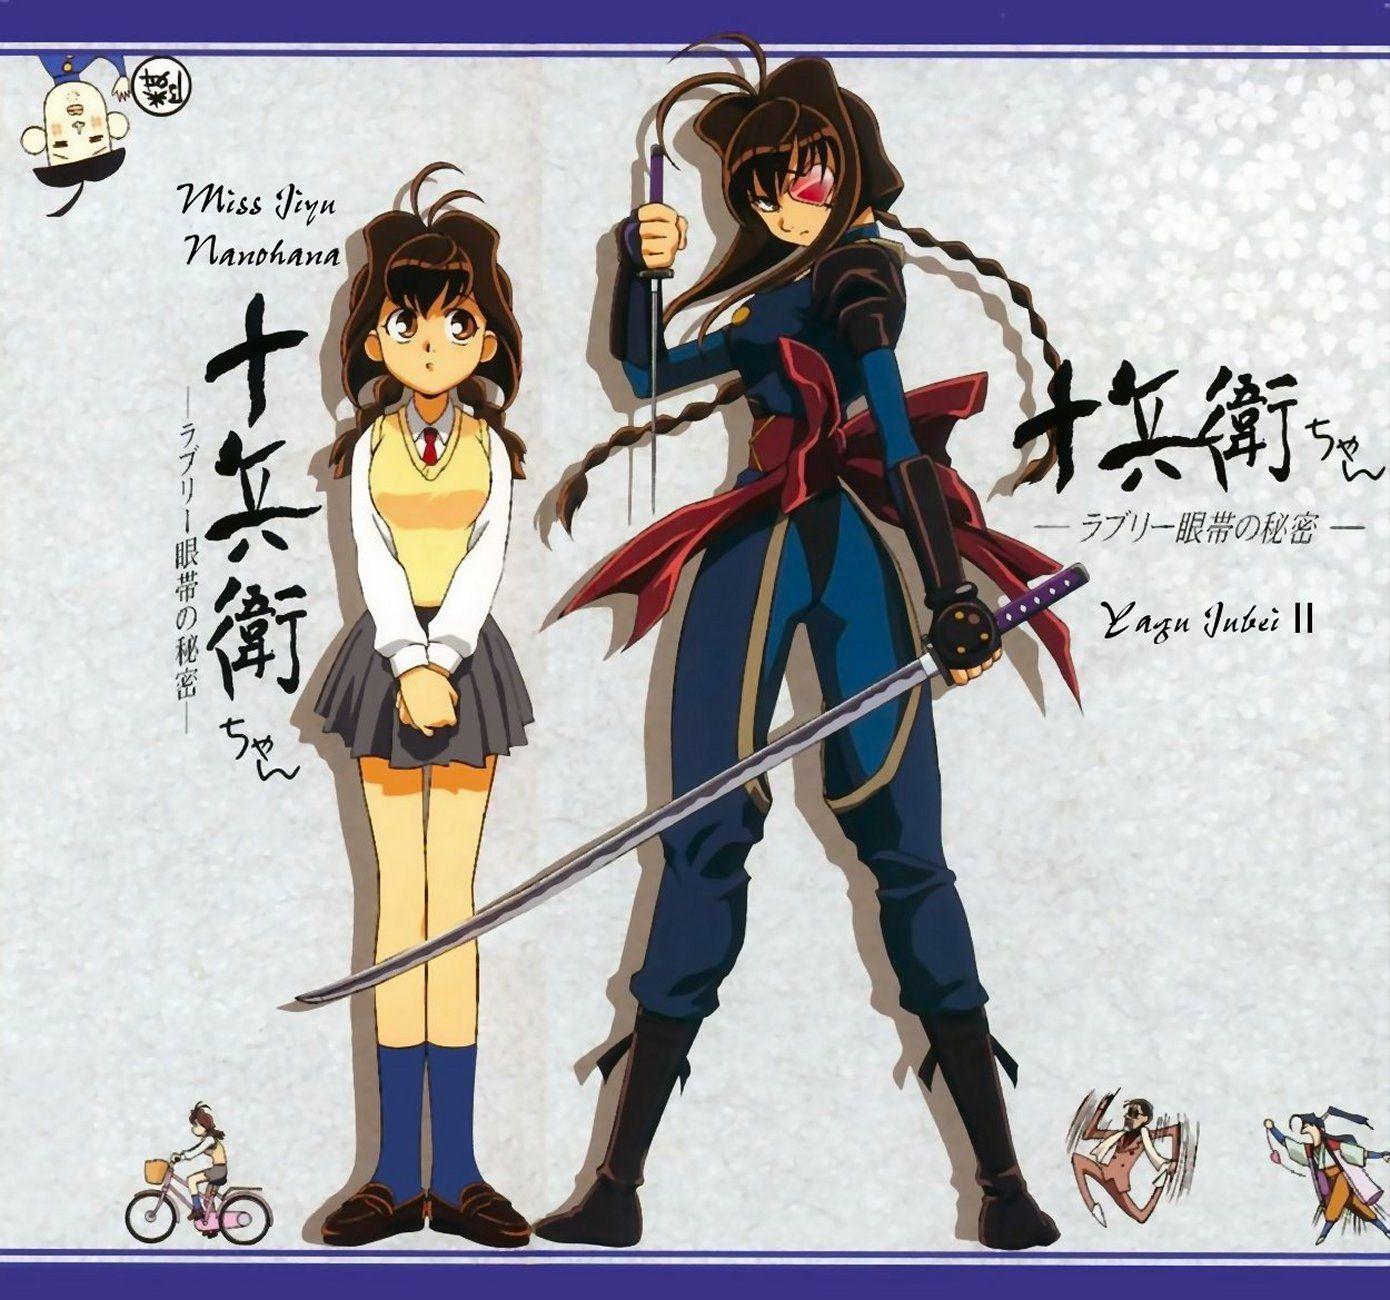 JubeiChan (1999) Samurai champloo, Anime, Ninja girl